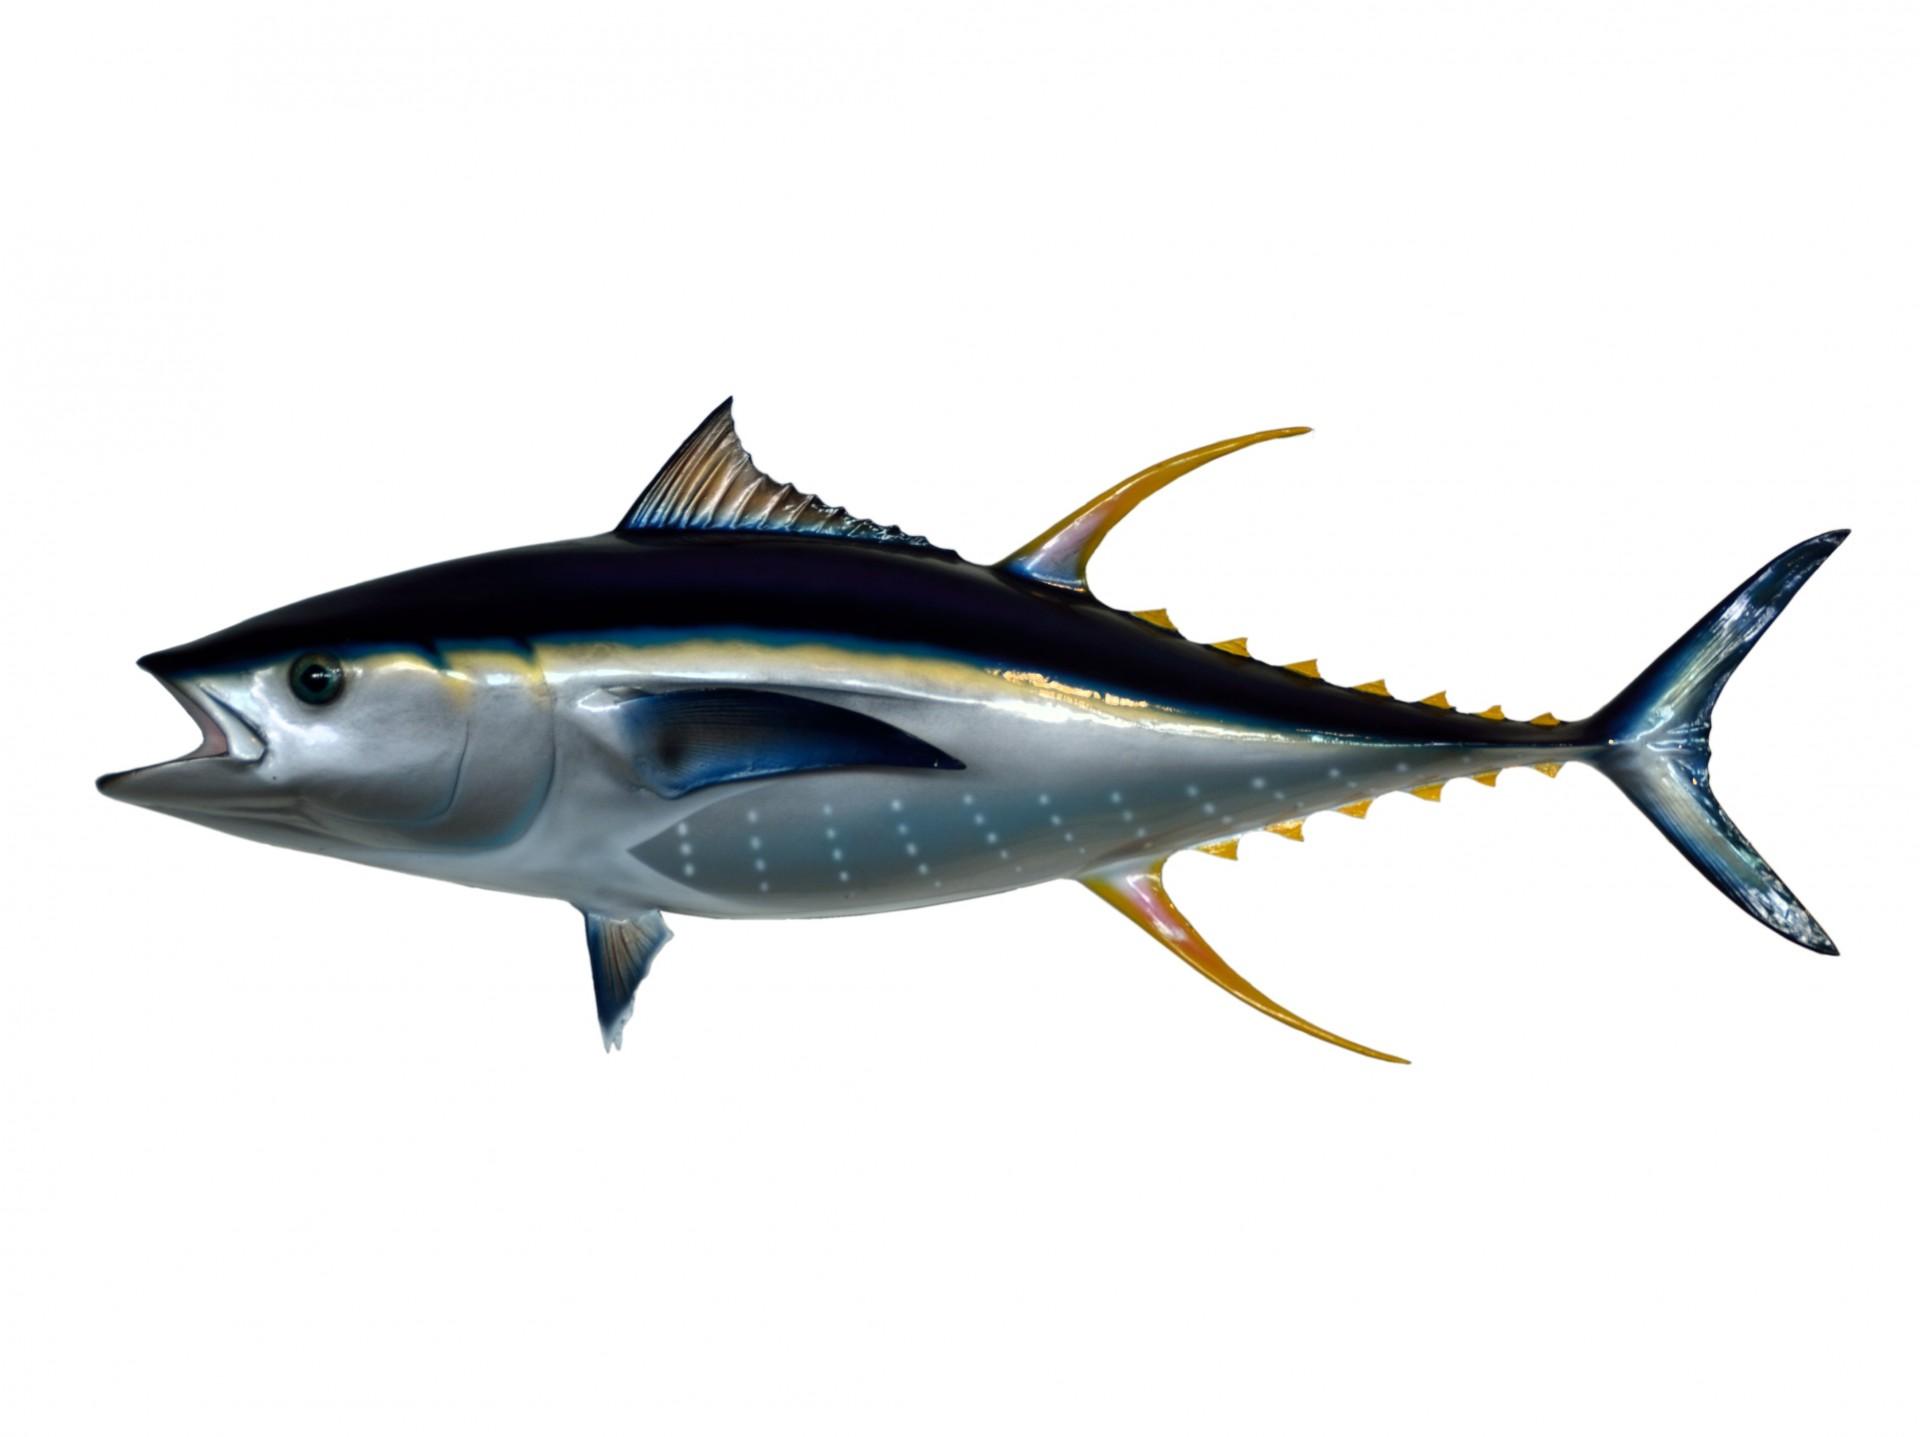 Tuna Clip Art Free Stock Photo.